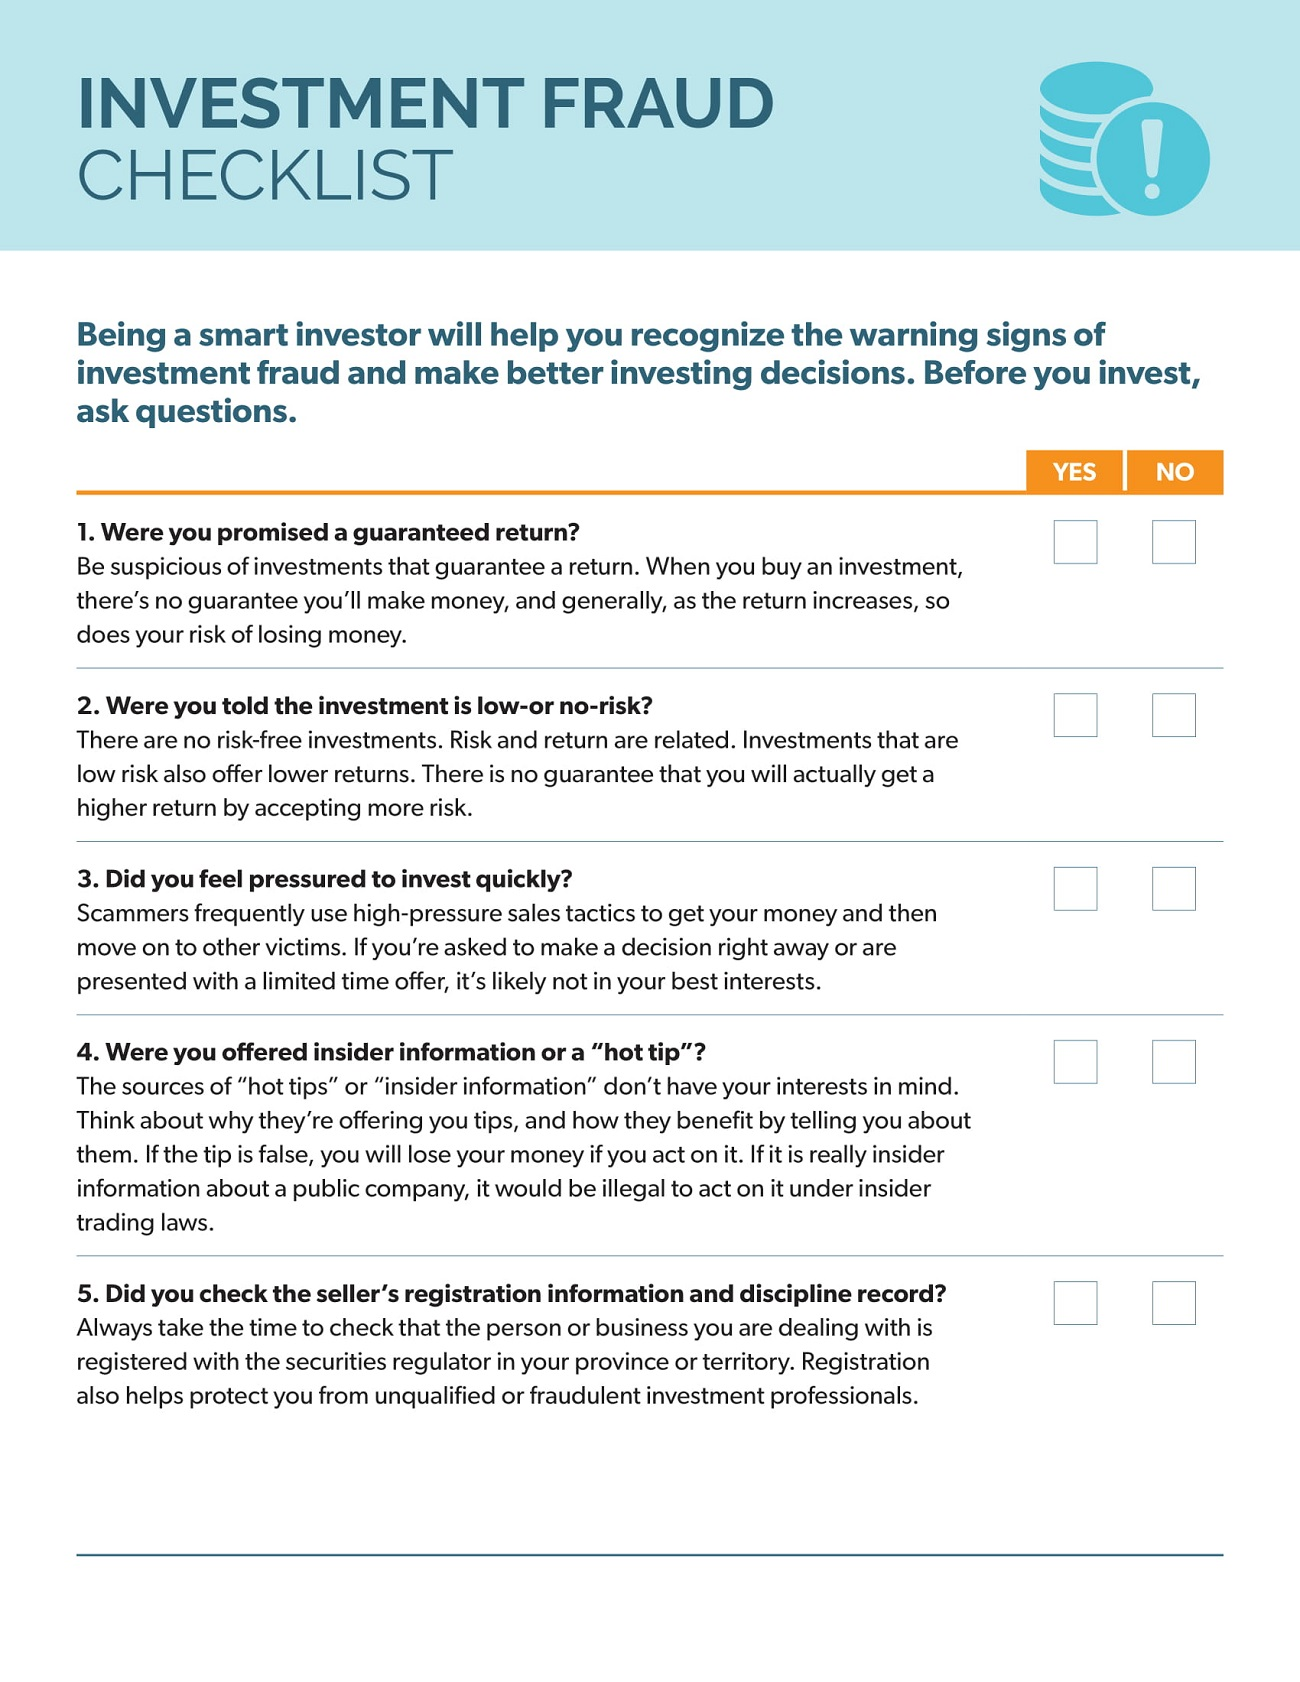 Investment Fraud Checklist PDF Template